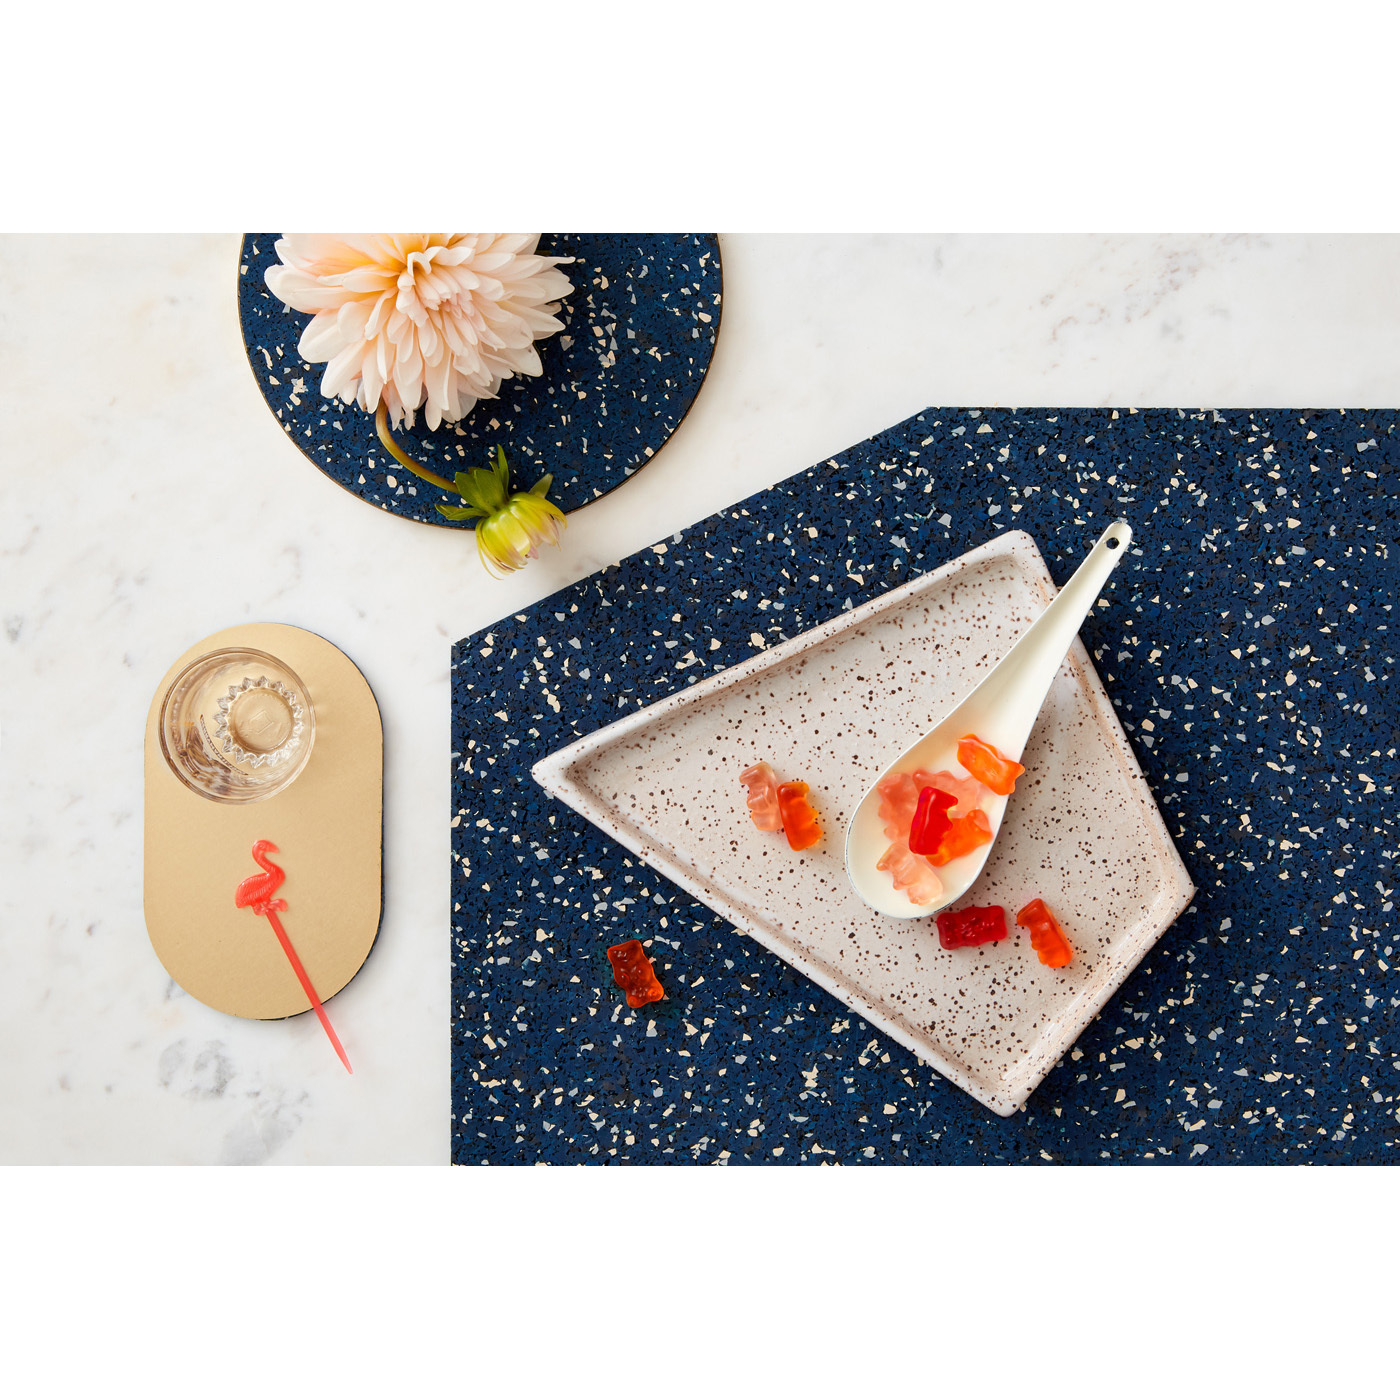 Slash objects rubber placemat trivet coaster royal scene